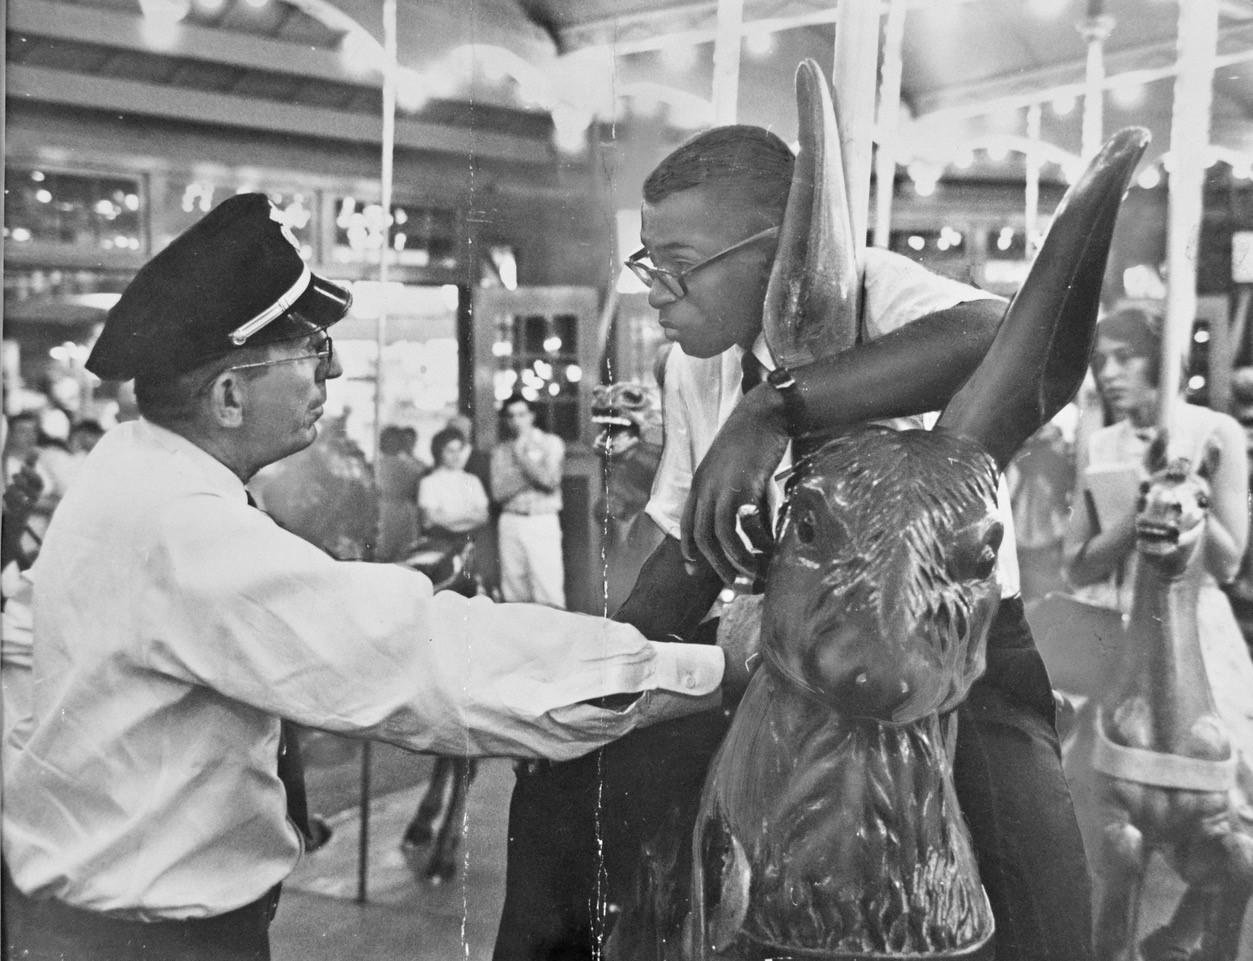 Glen Echo Park Dentzel Carousel Civil Rights protest